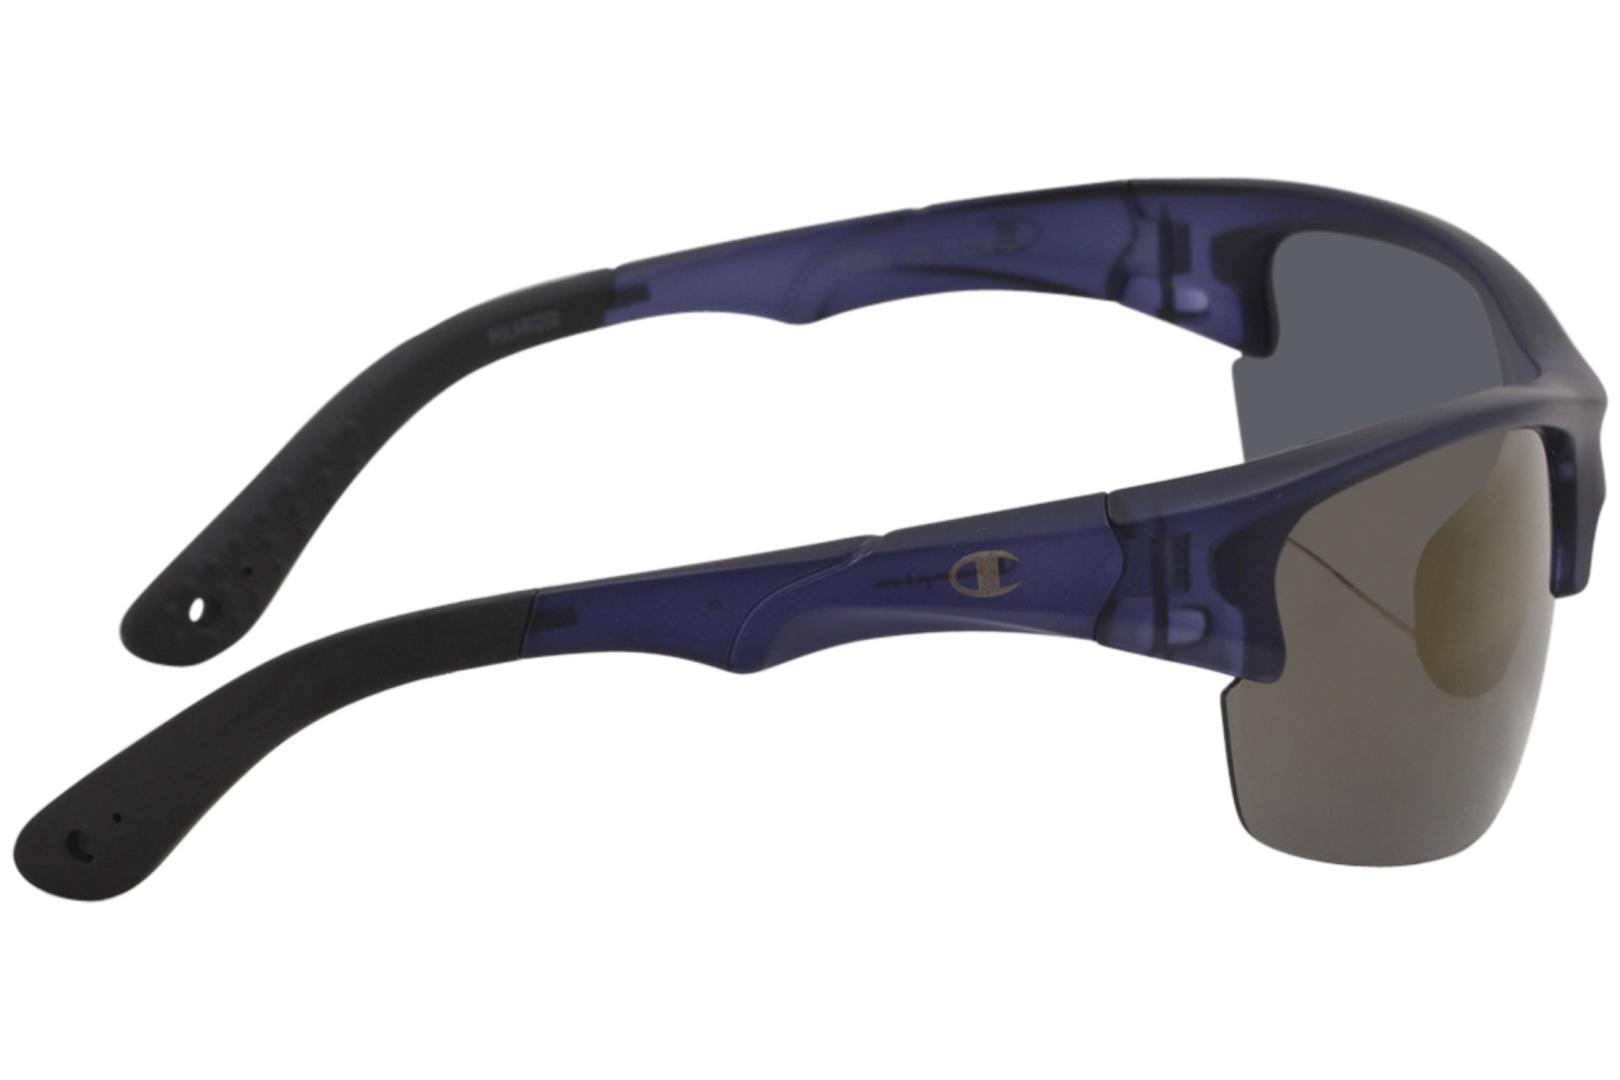 7a4184778f3 Champion Men s CU5095 CU 5095 Sport Wrap Sunglasses by Champion